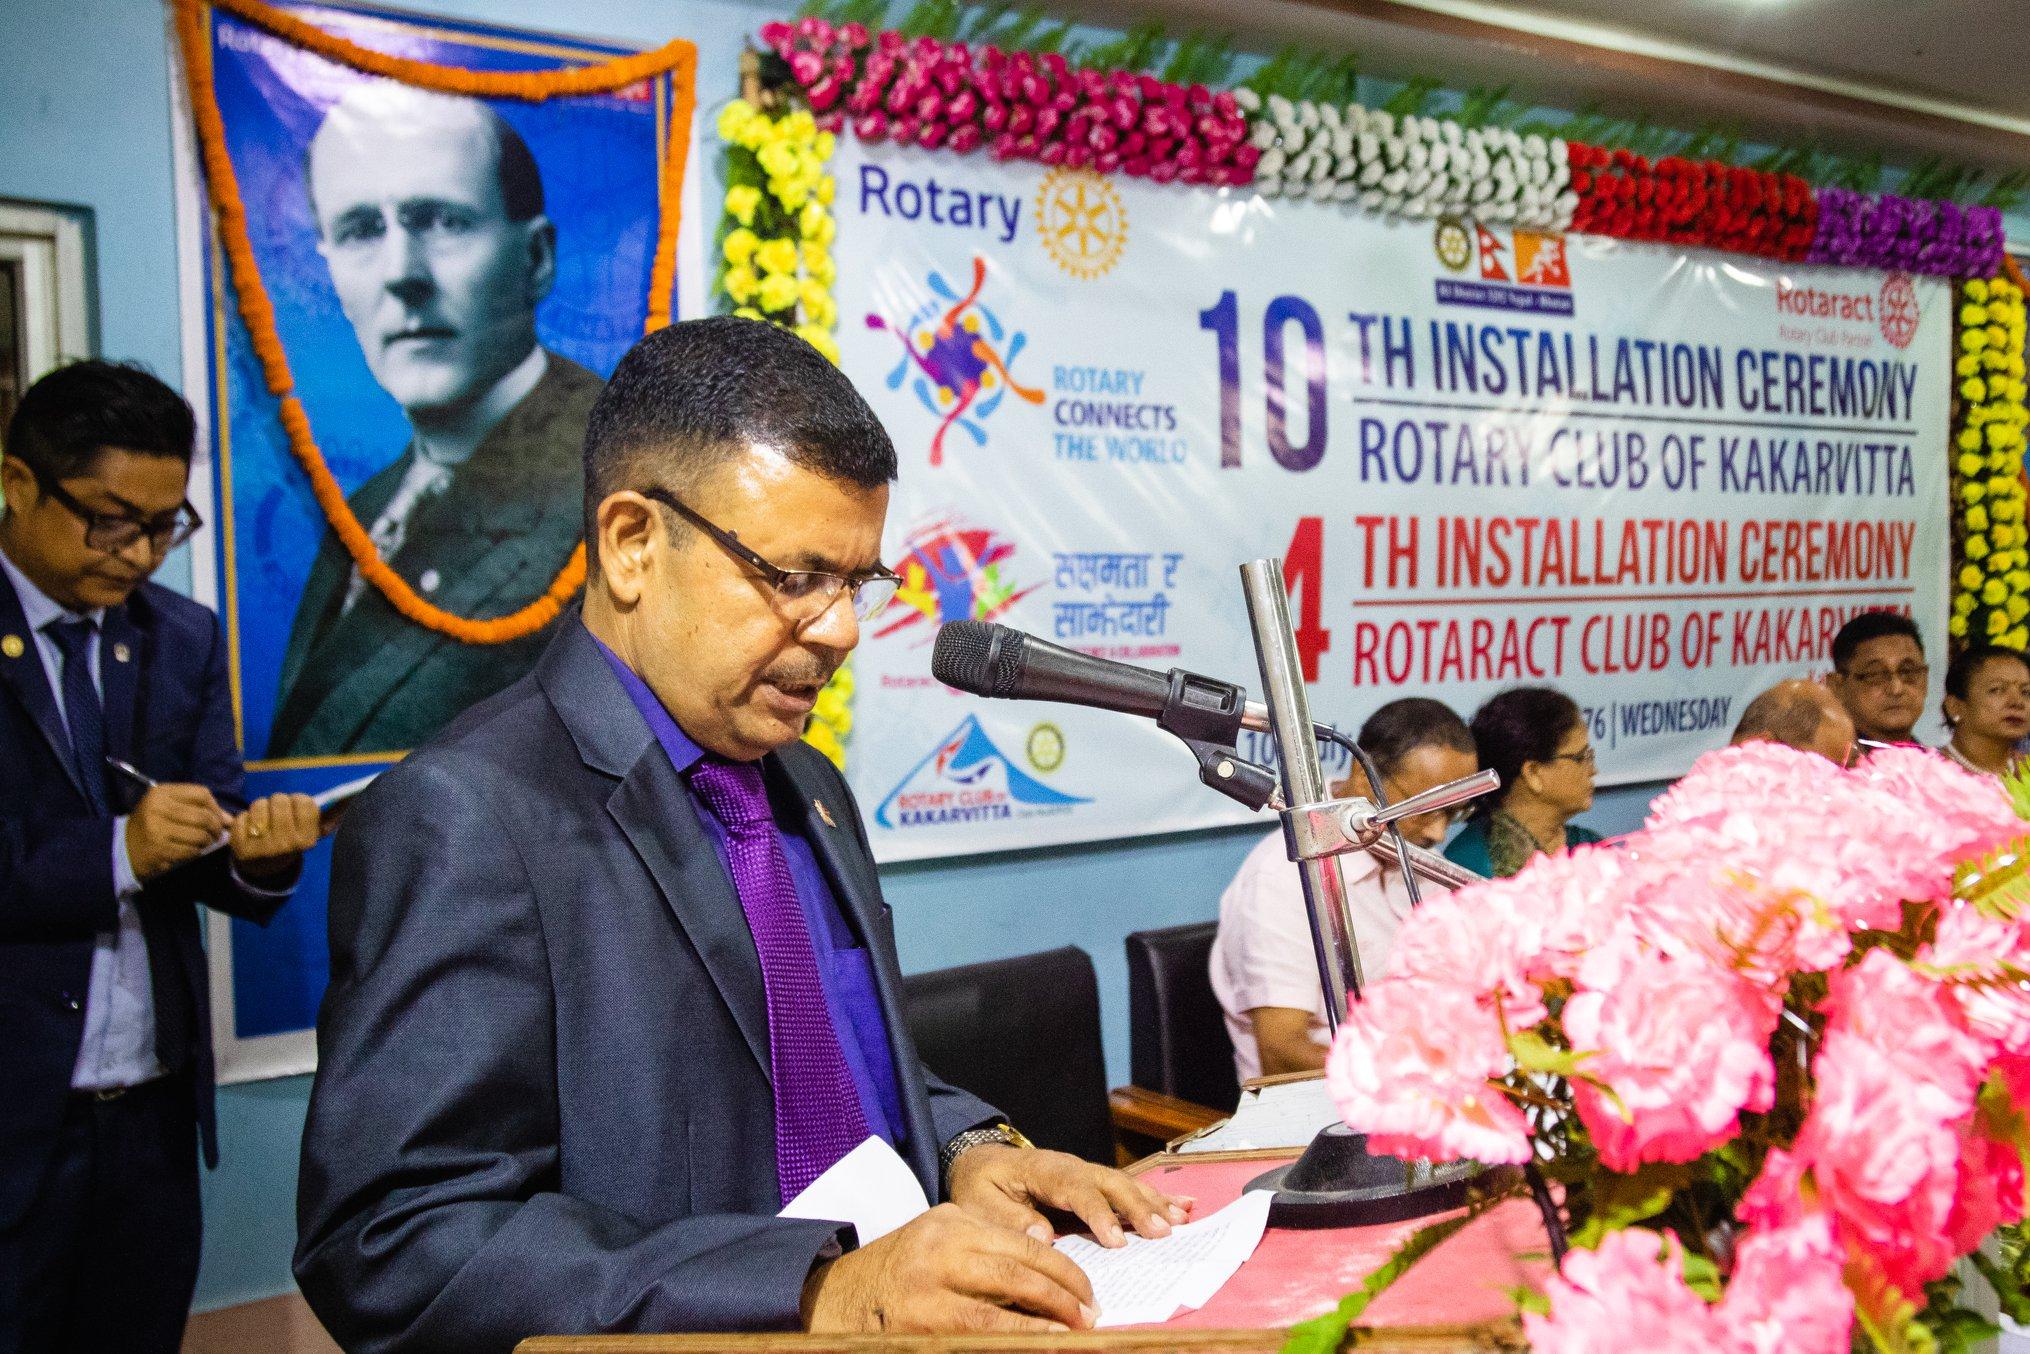 10th Installation Ceremony Rotary Club Of Kakarvitta 3